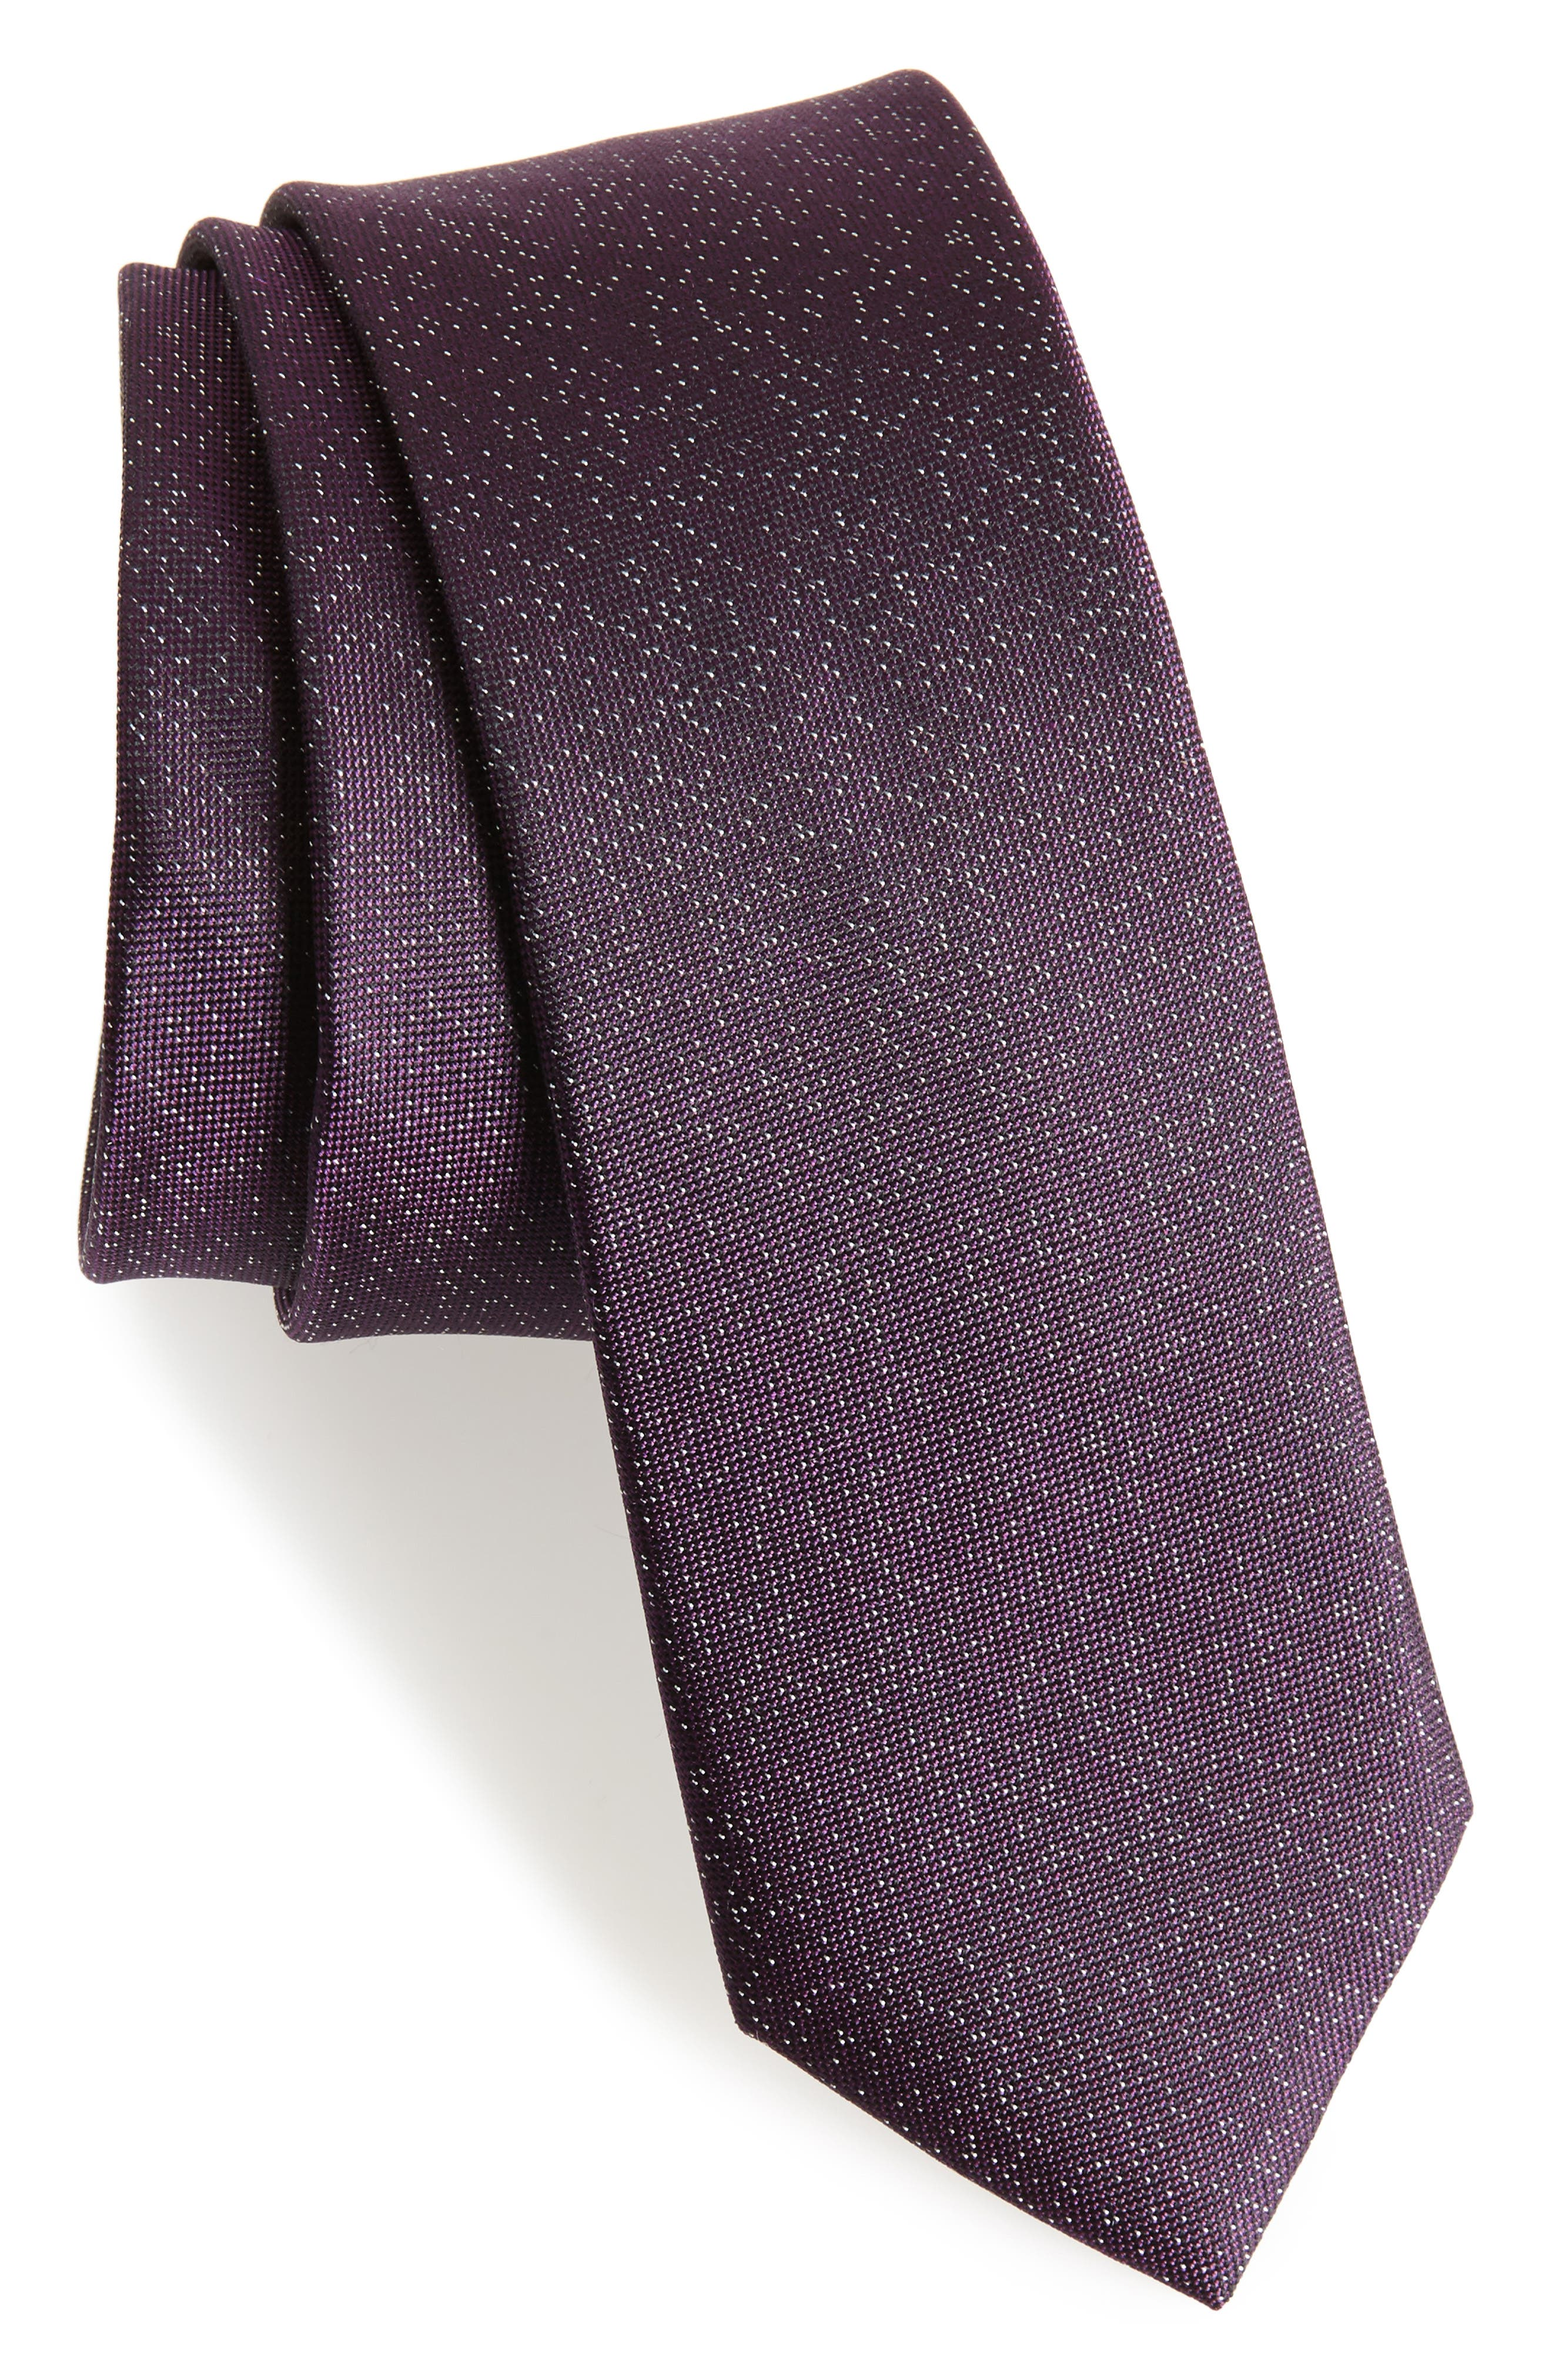 Alternate Image 1 Selected - Calibrate Confetti Silk Skinny Tie